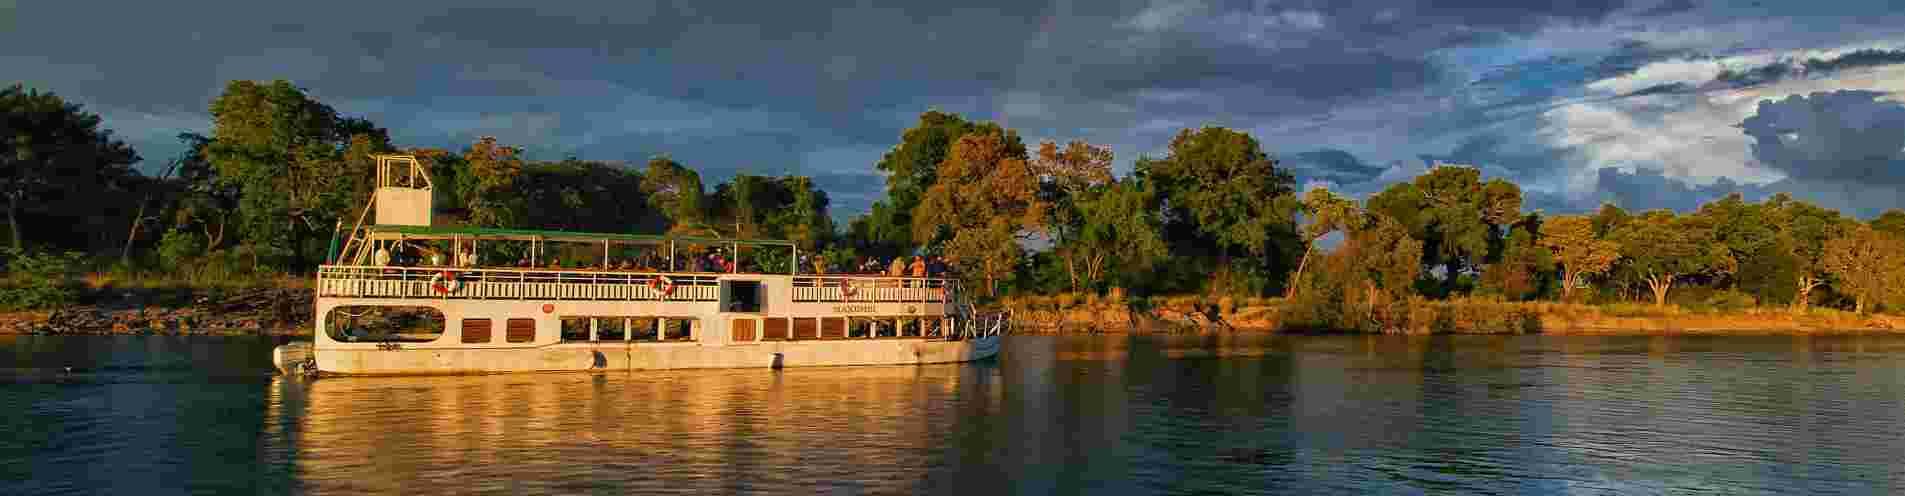 Zambia header image